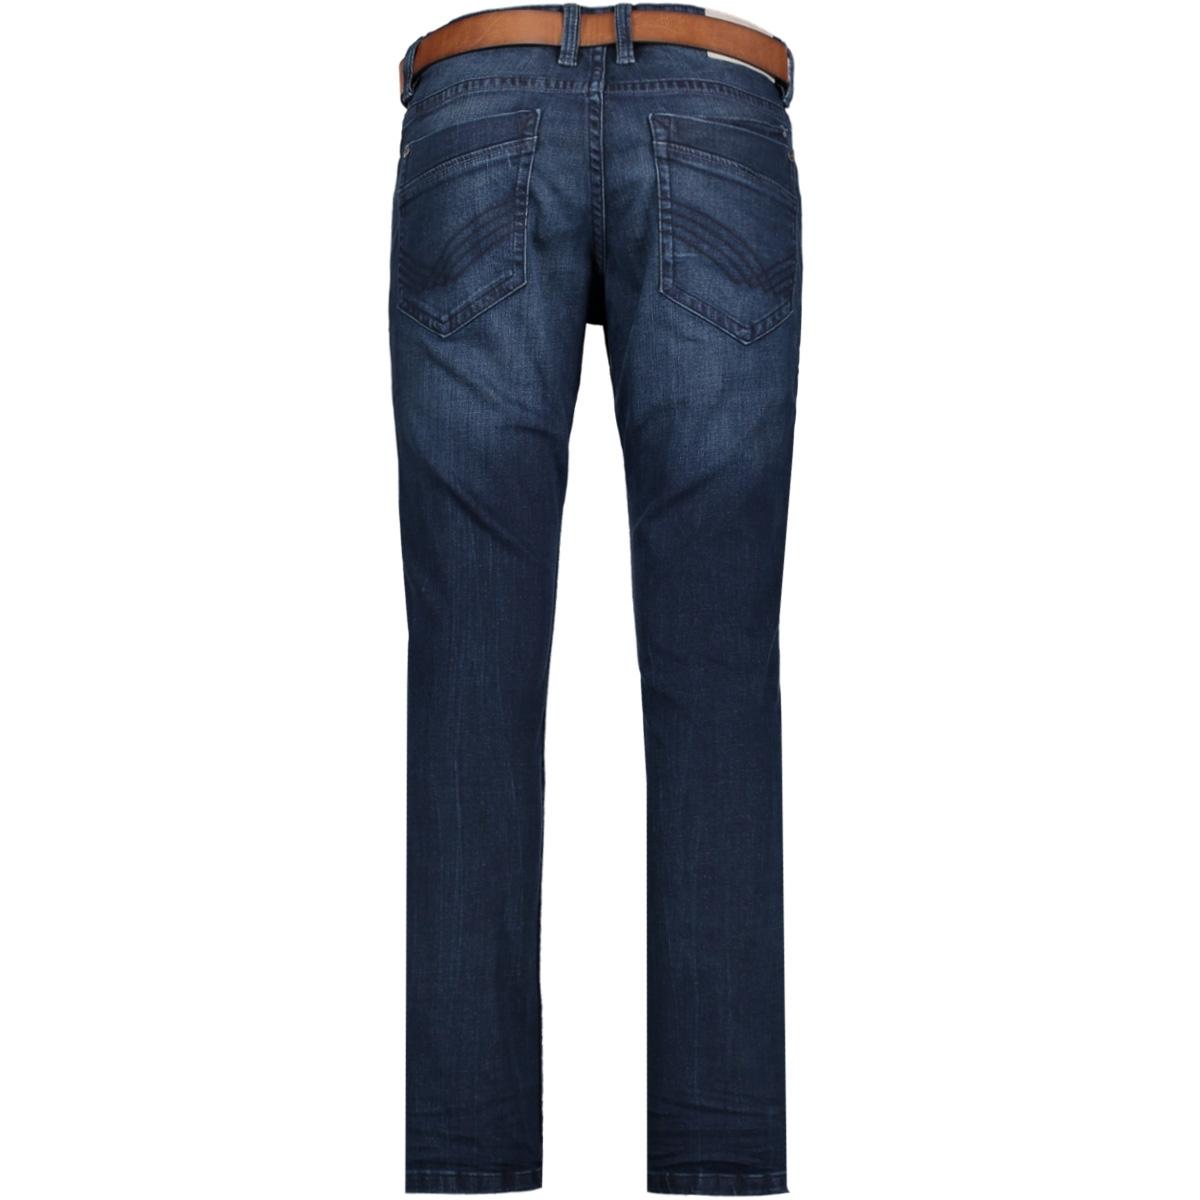 6205845.09.10 tom tailor jeans 1055